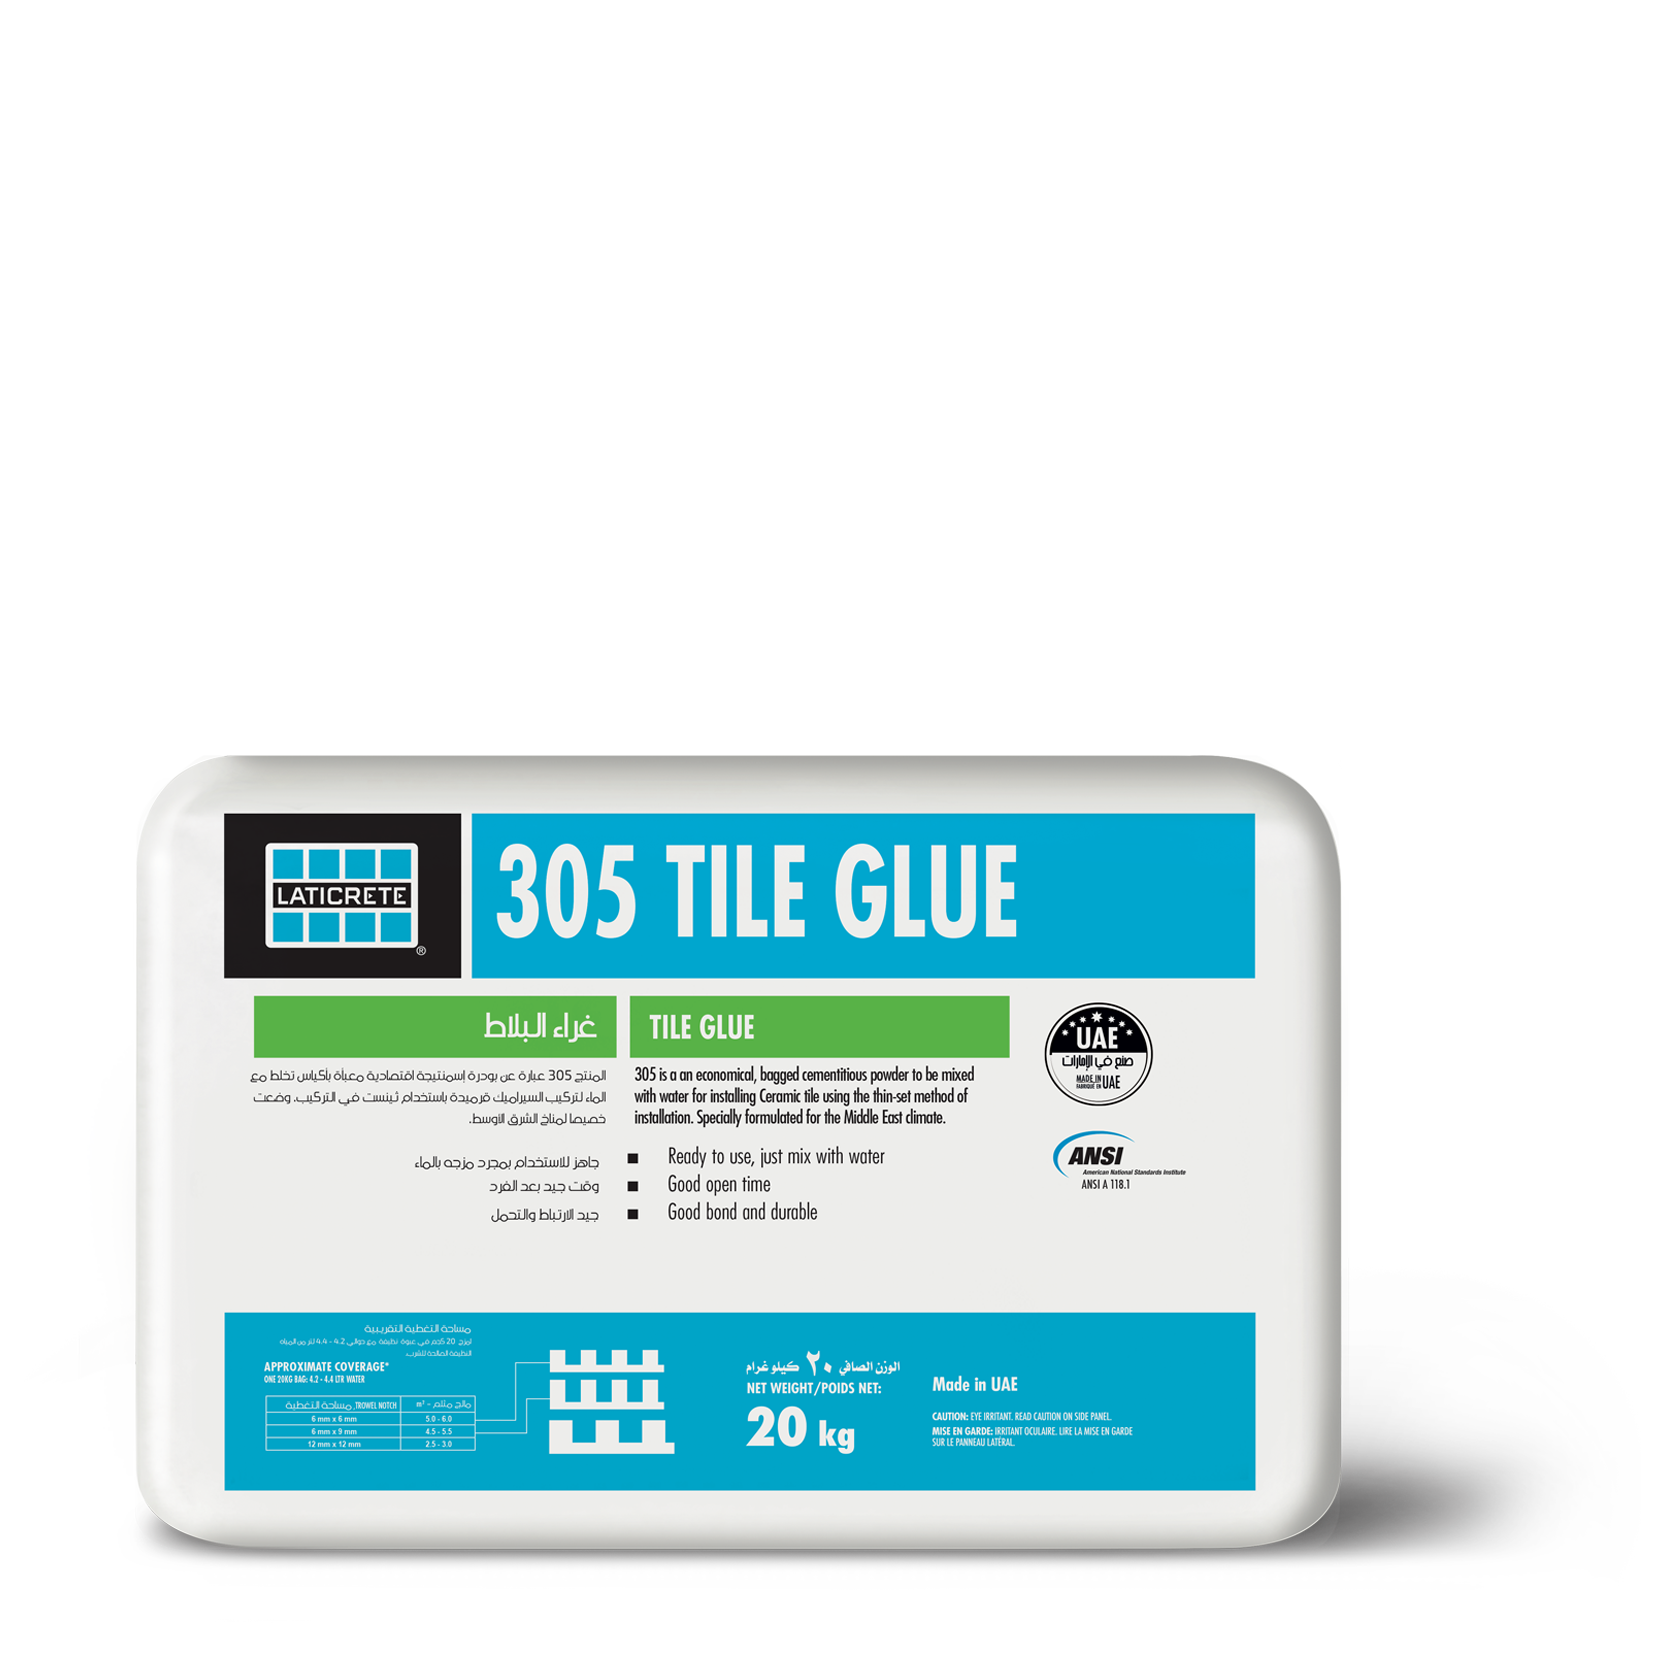 305 Tile Glue